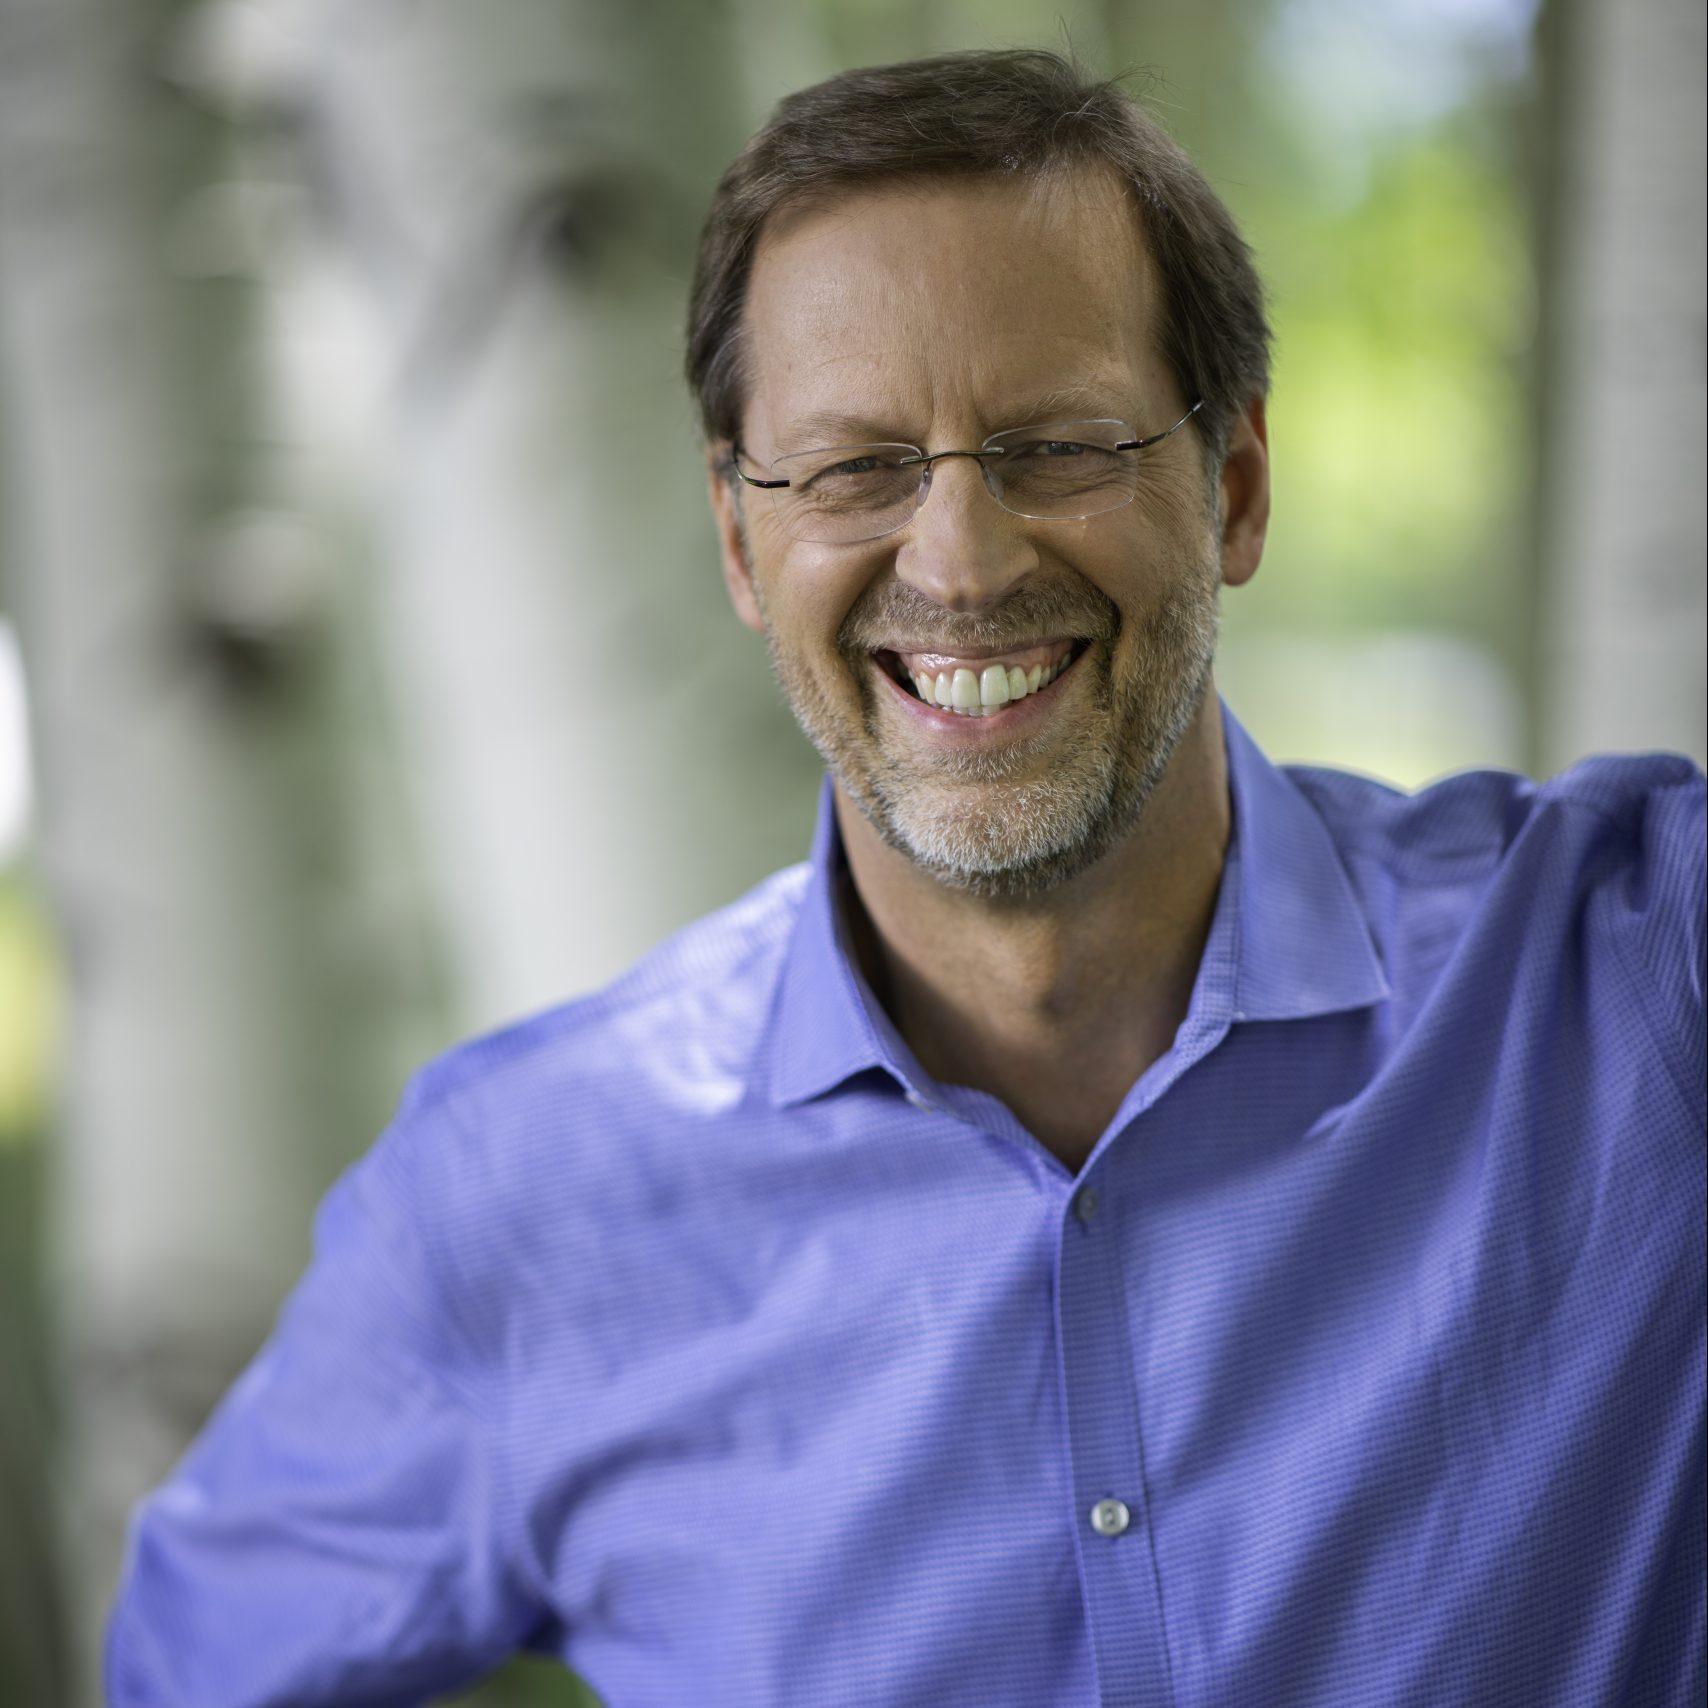 Daniel Porterfield, President and CEO, Aspen Institute